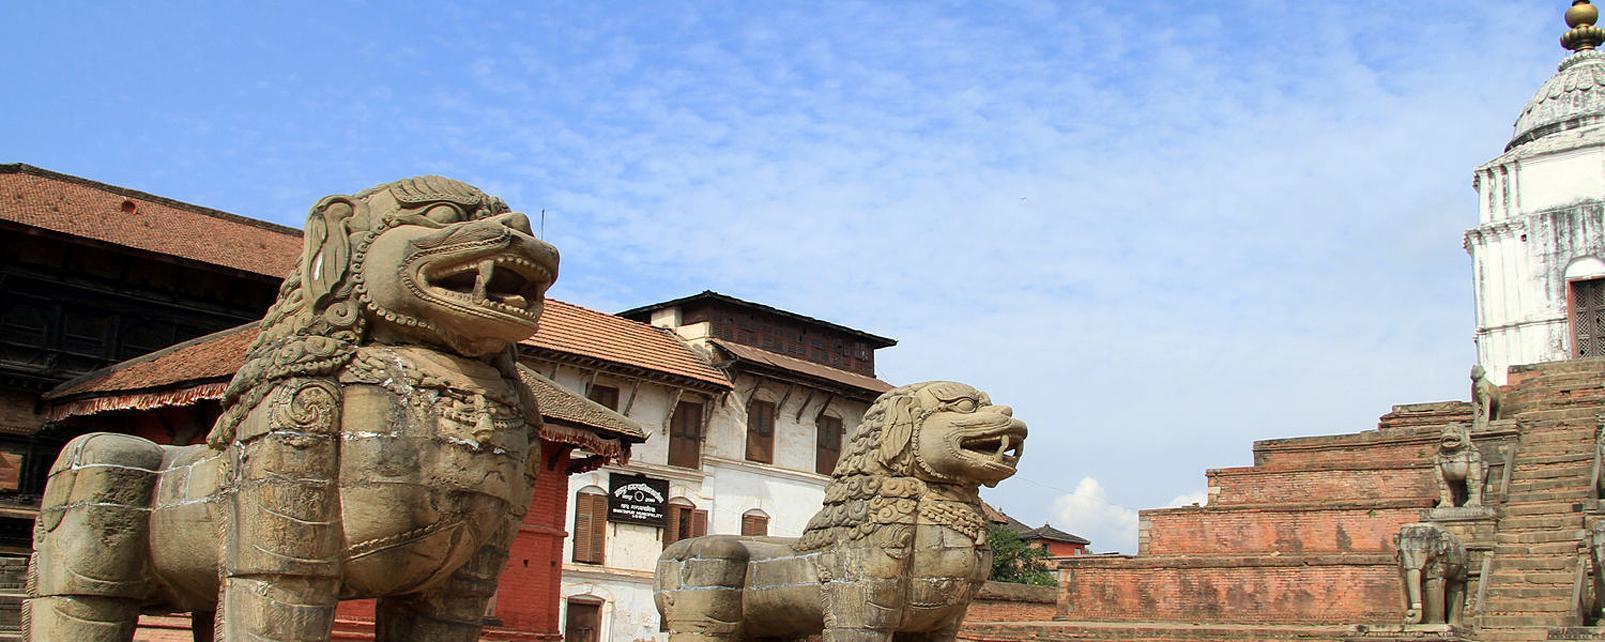 Asie; Népal; Bhaktapur;